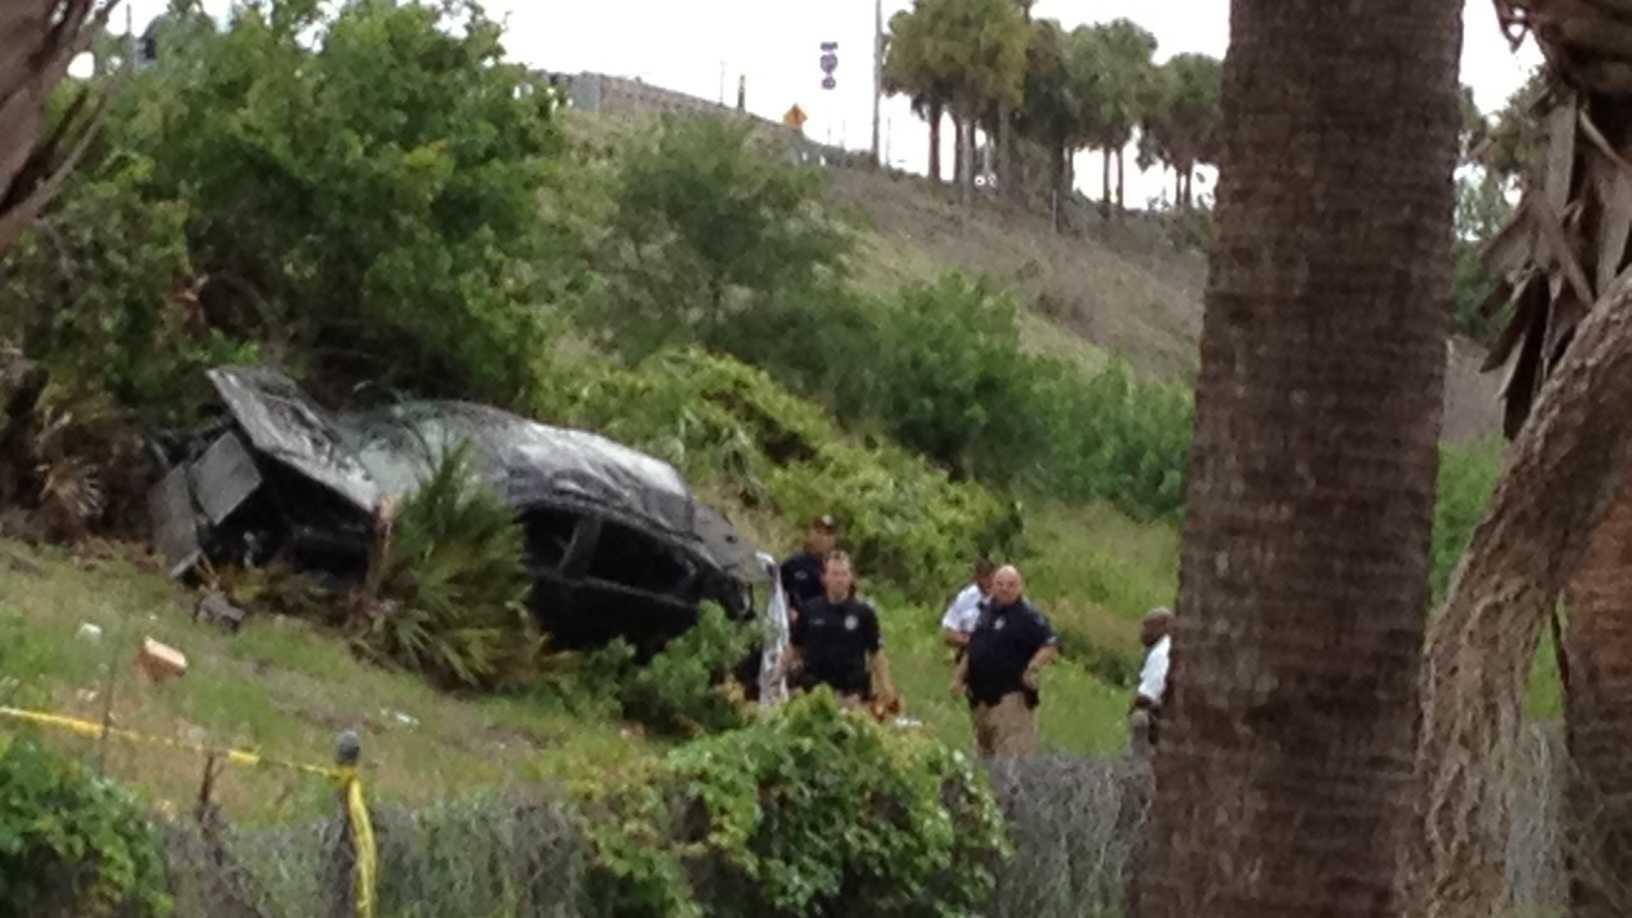 Dunkin' Donuts robbery suspect car crash